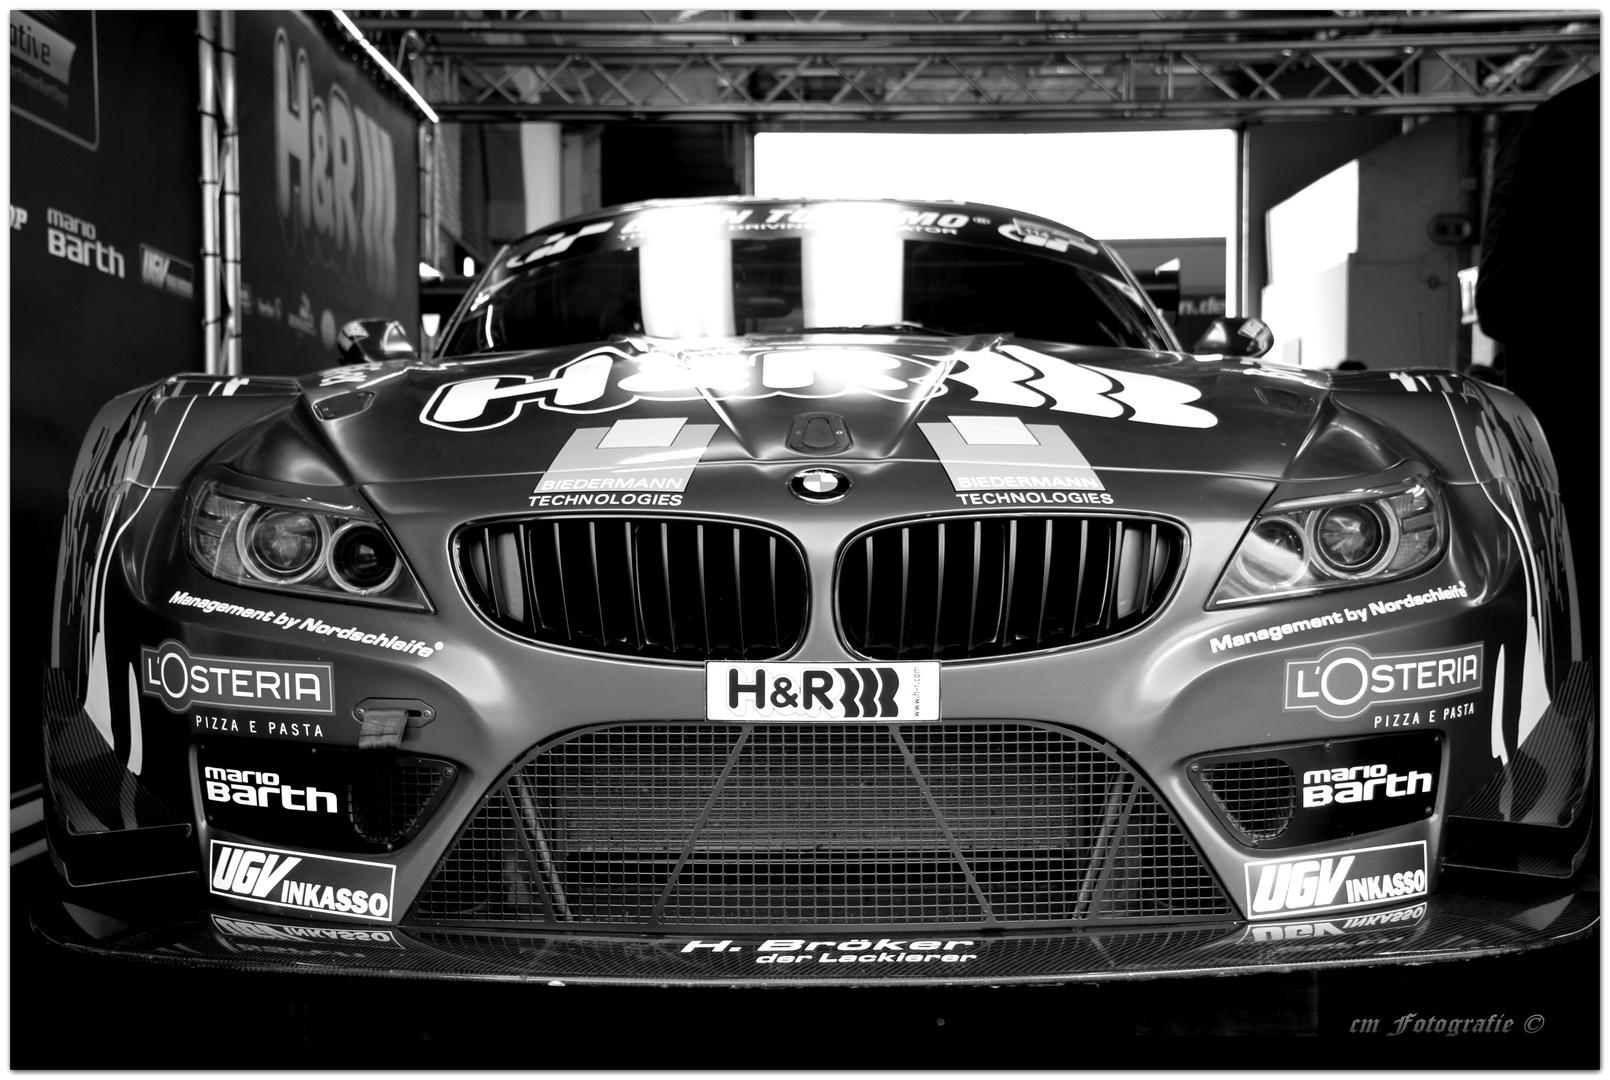 VLN 1 Lauf Nürburgring 29.o3.2o14 / 2